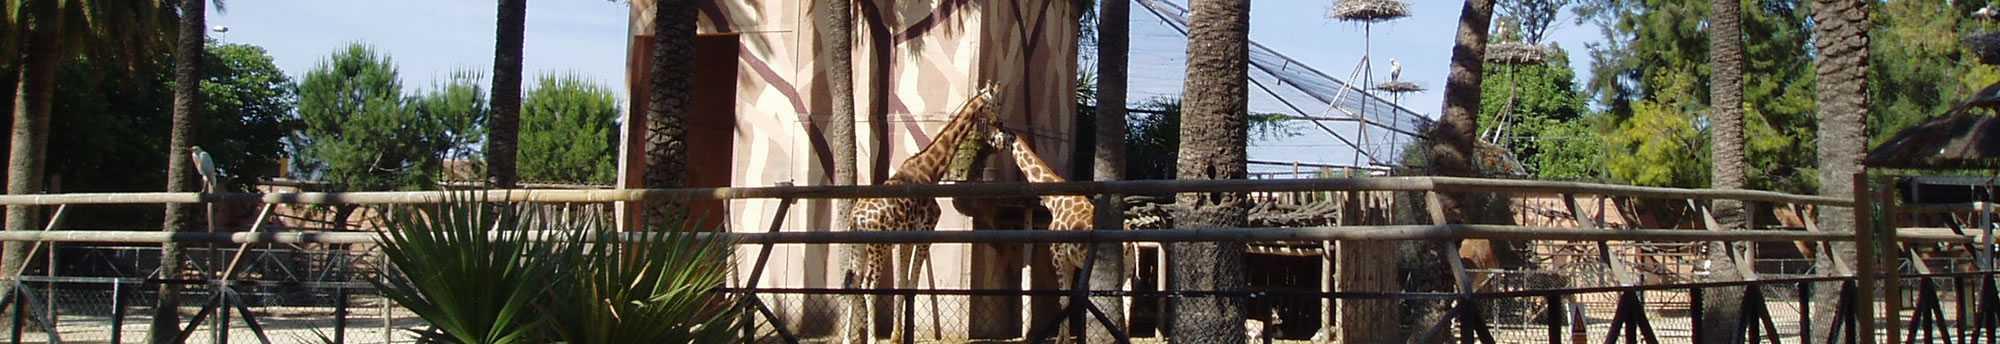 Entradas al Zoobotánico de Jerez